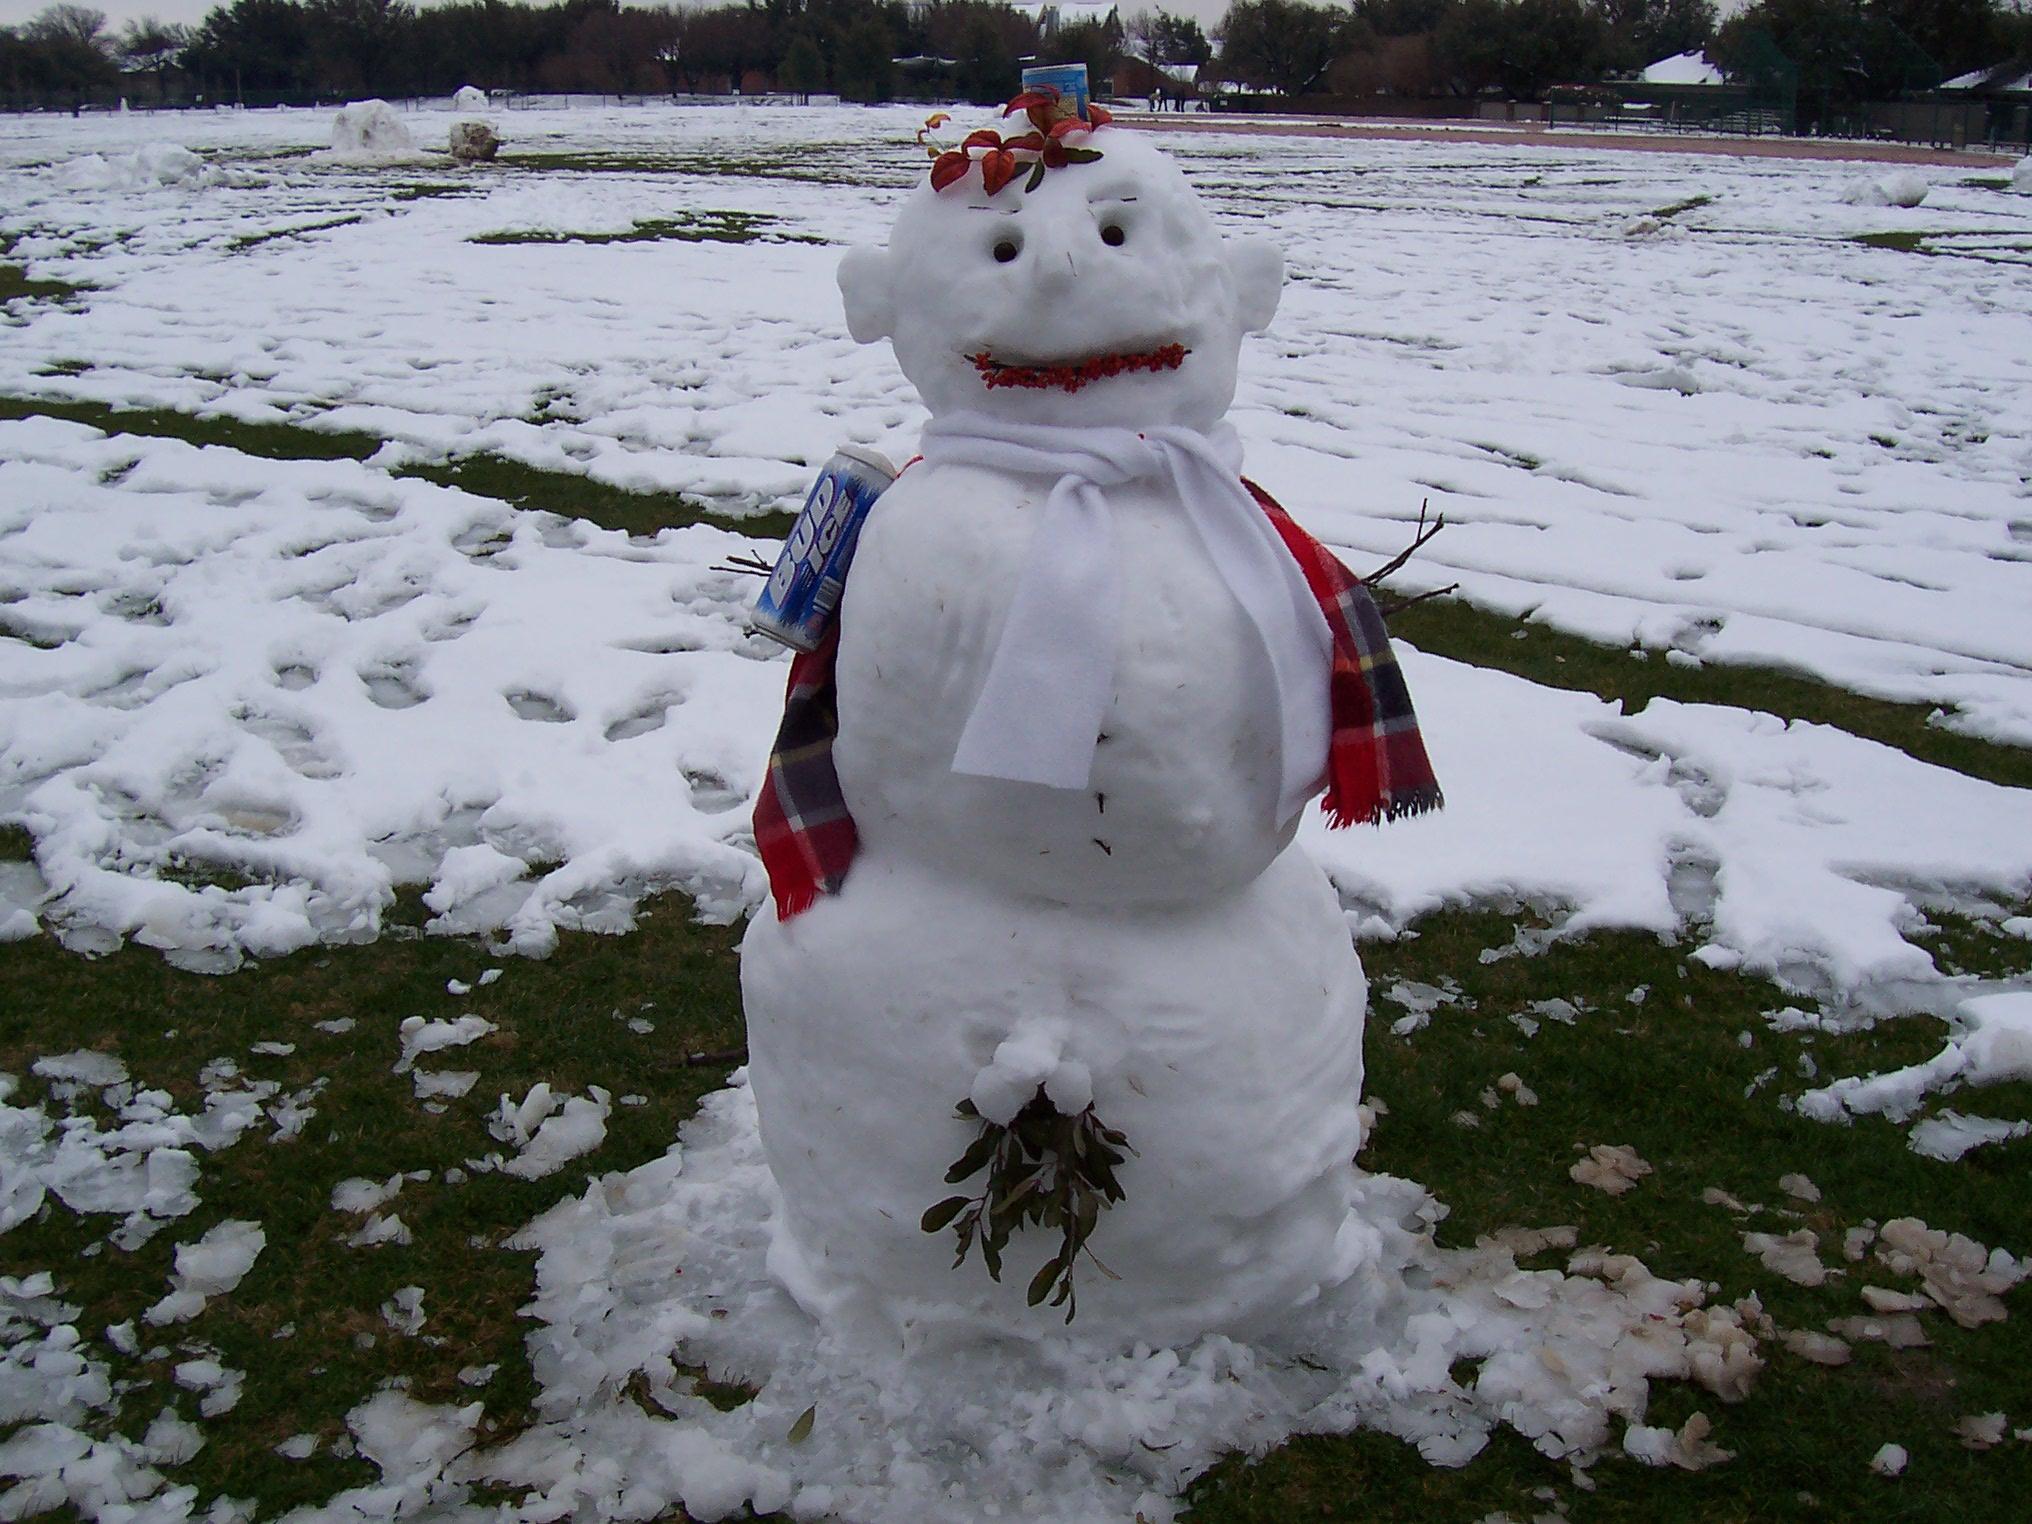 x_rated_snowman.JPG